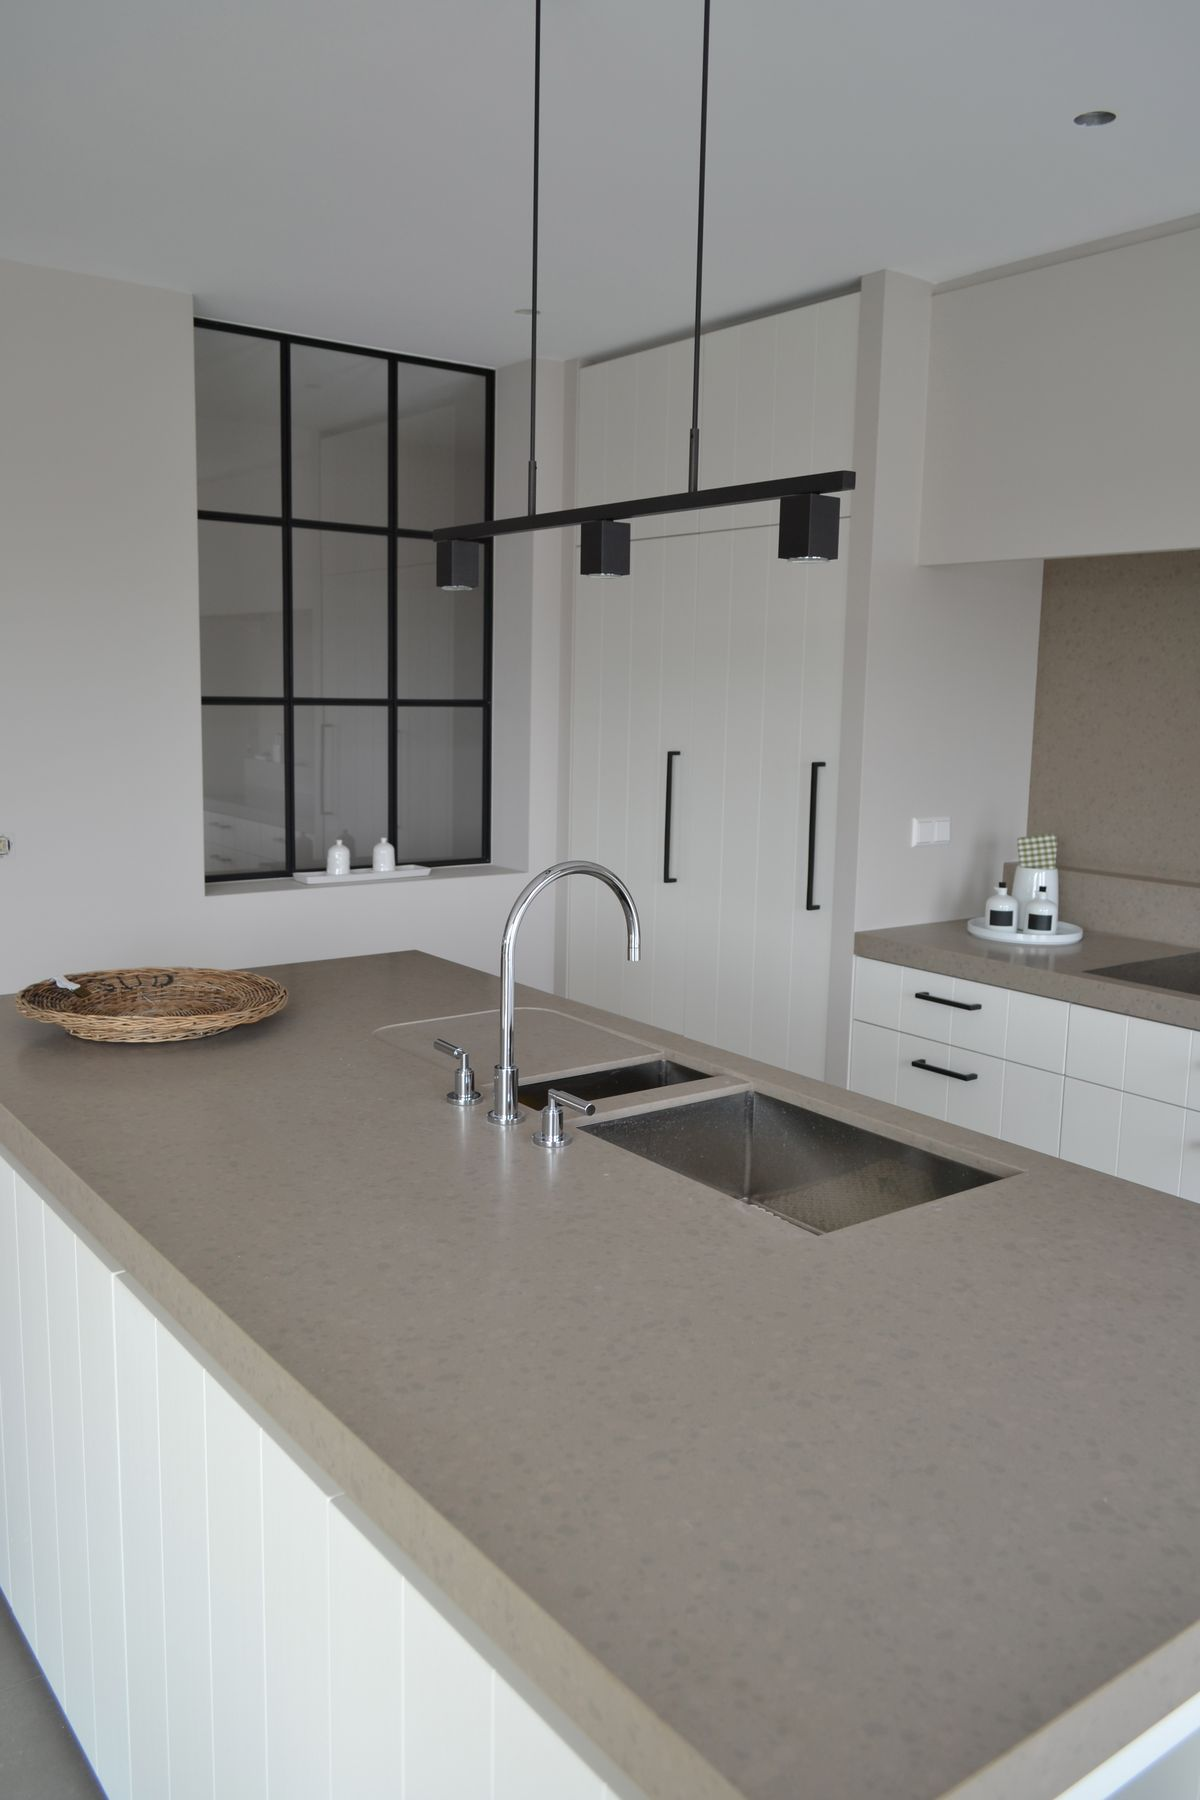 ber ideen zu betonb den auf pinterest betonb den malerei fu b den und farbbeton. Black Bedroom Furniture Sets. Home Design Ideas